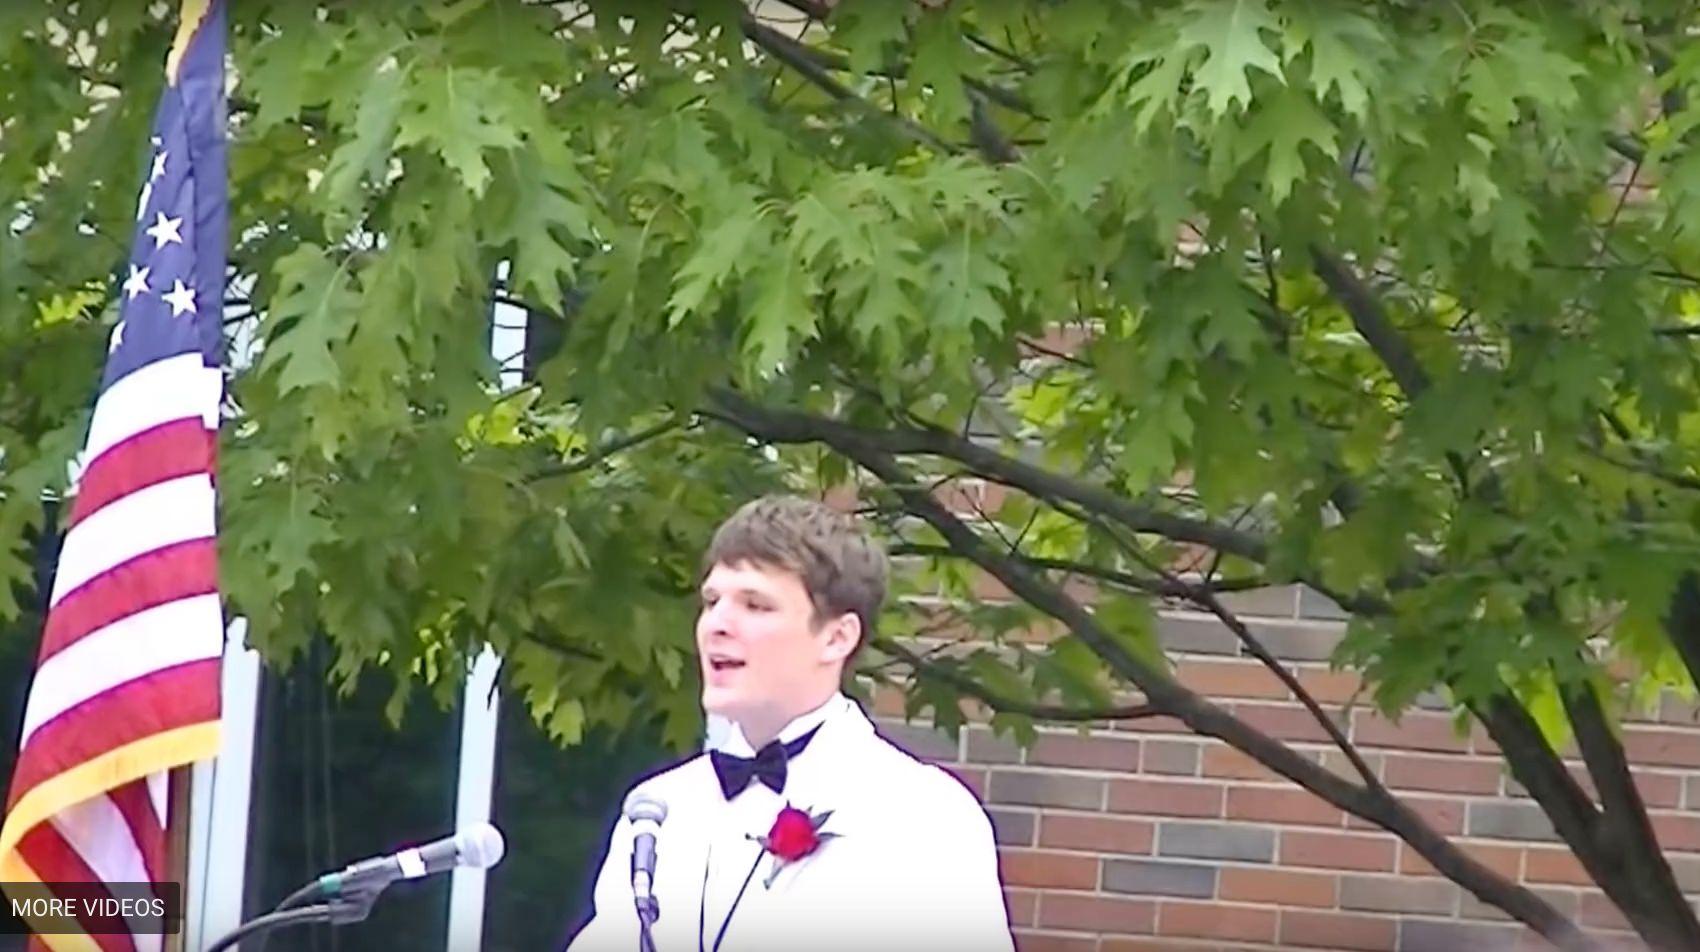 In 2013, Otto Warmbier spokebefore his graduating high school class.